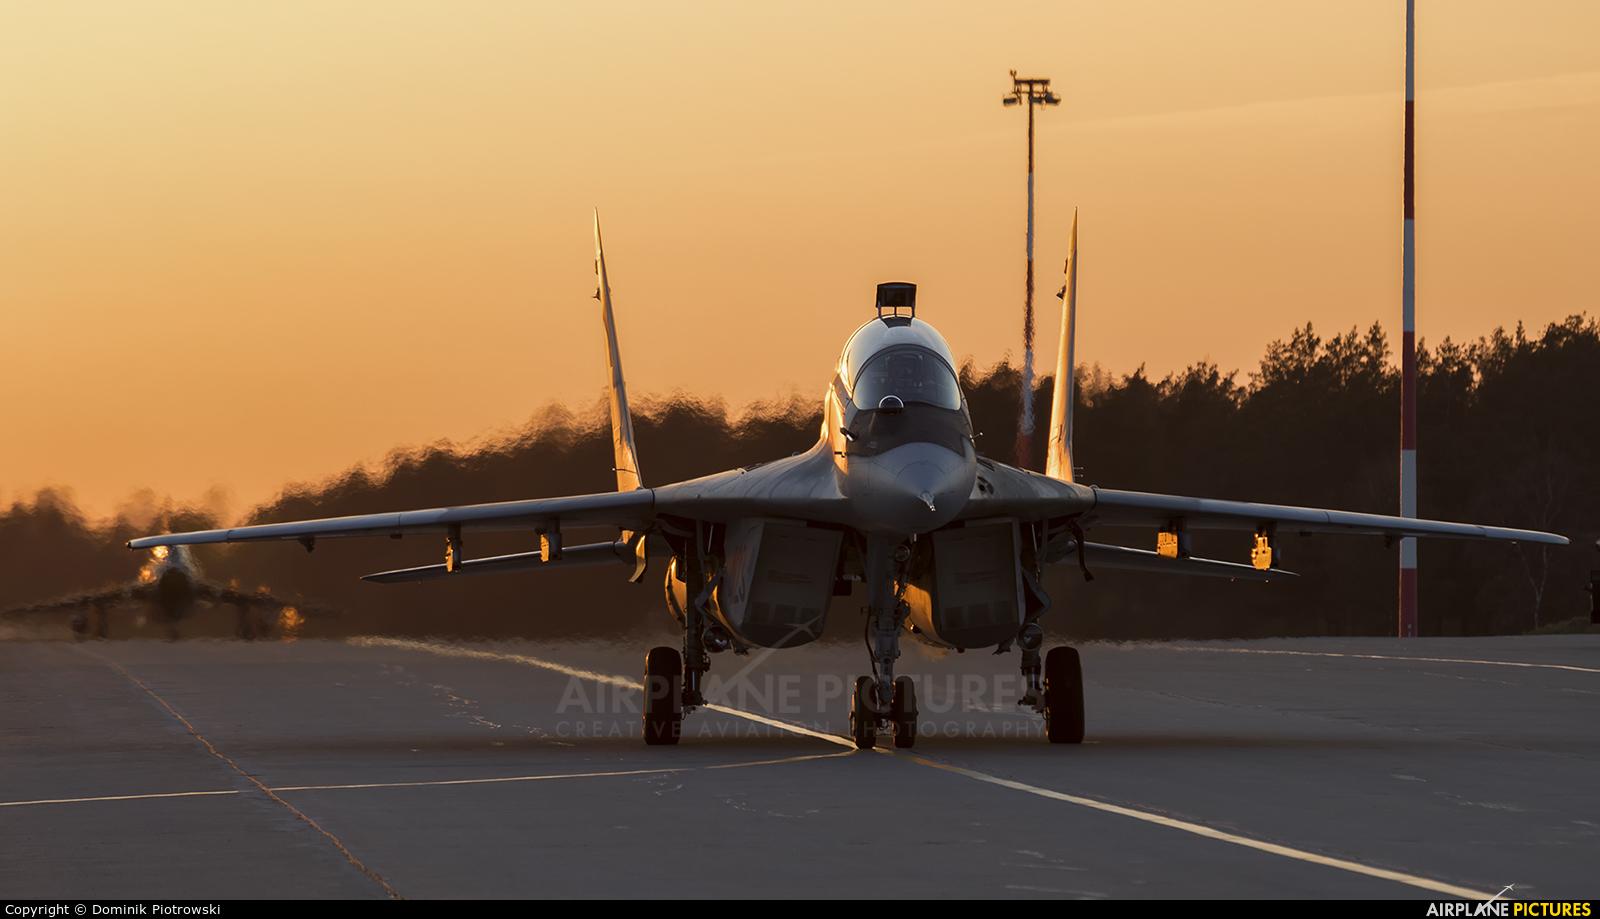 Poland - Air Force 4123 aircraft at Świdwin